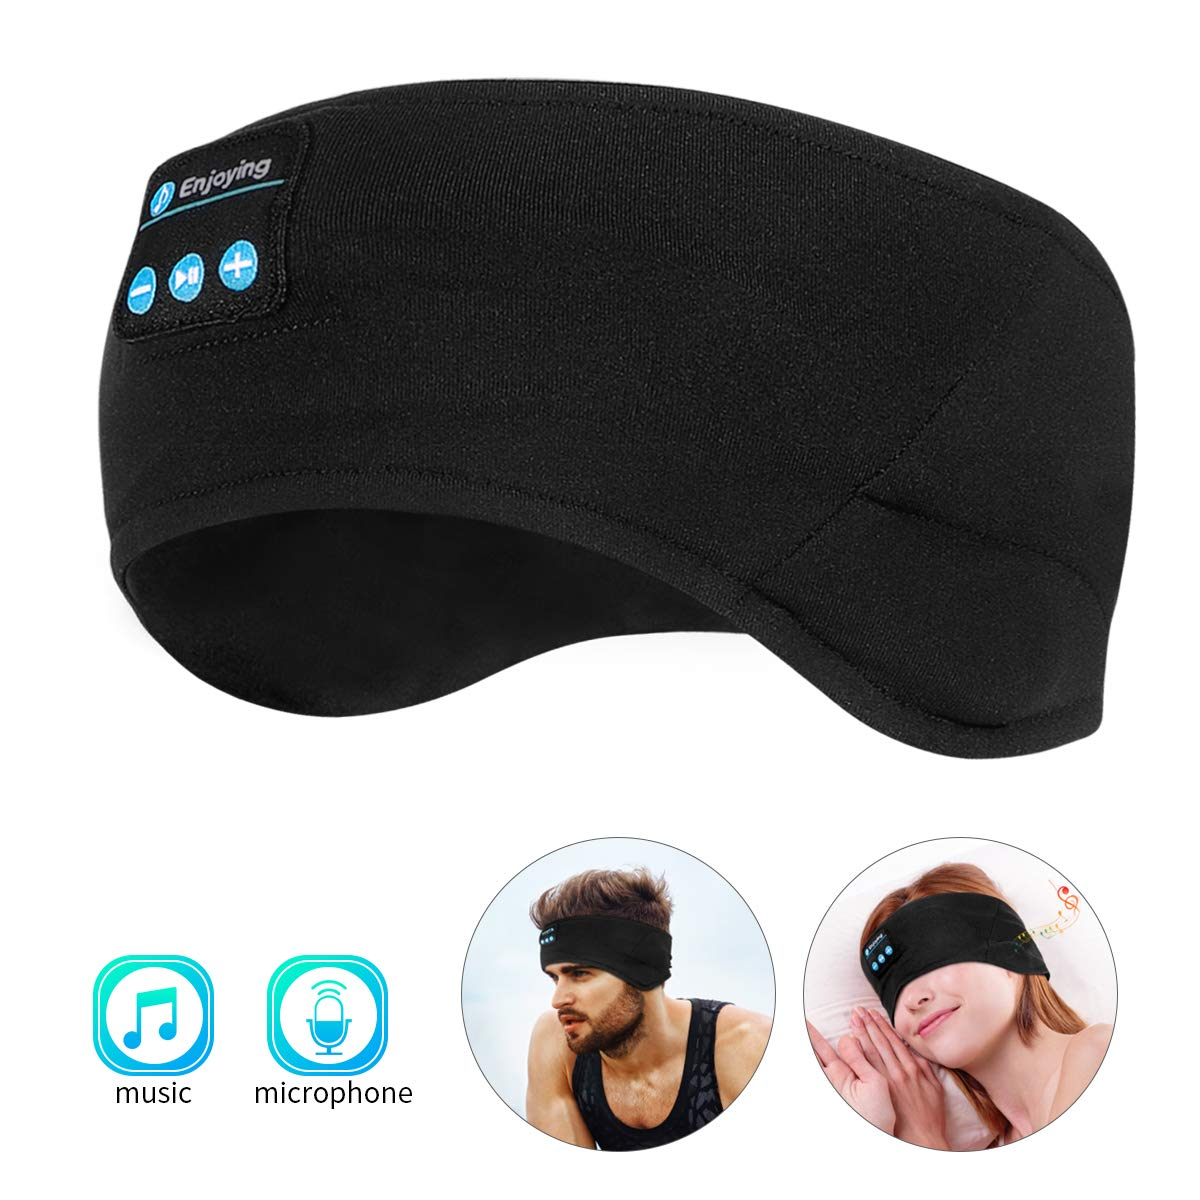 WU-MINGLU Bluetooth Headband Headphones for Sleeping, Running, Jogging Sleep Headband Bluetooth for Women Men